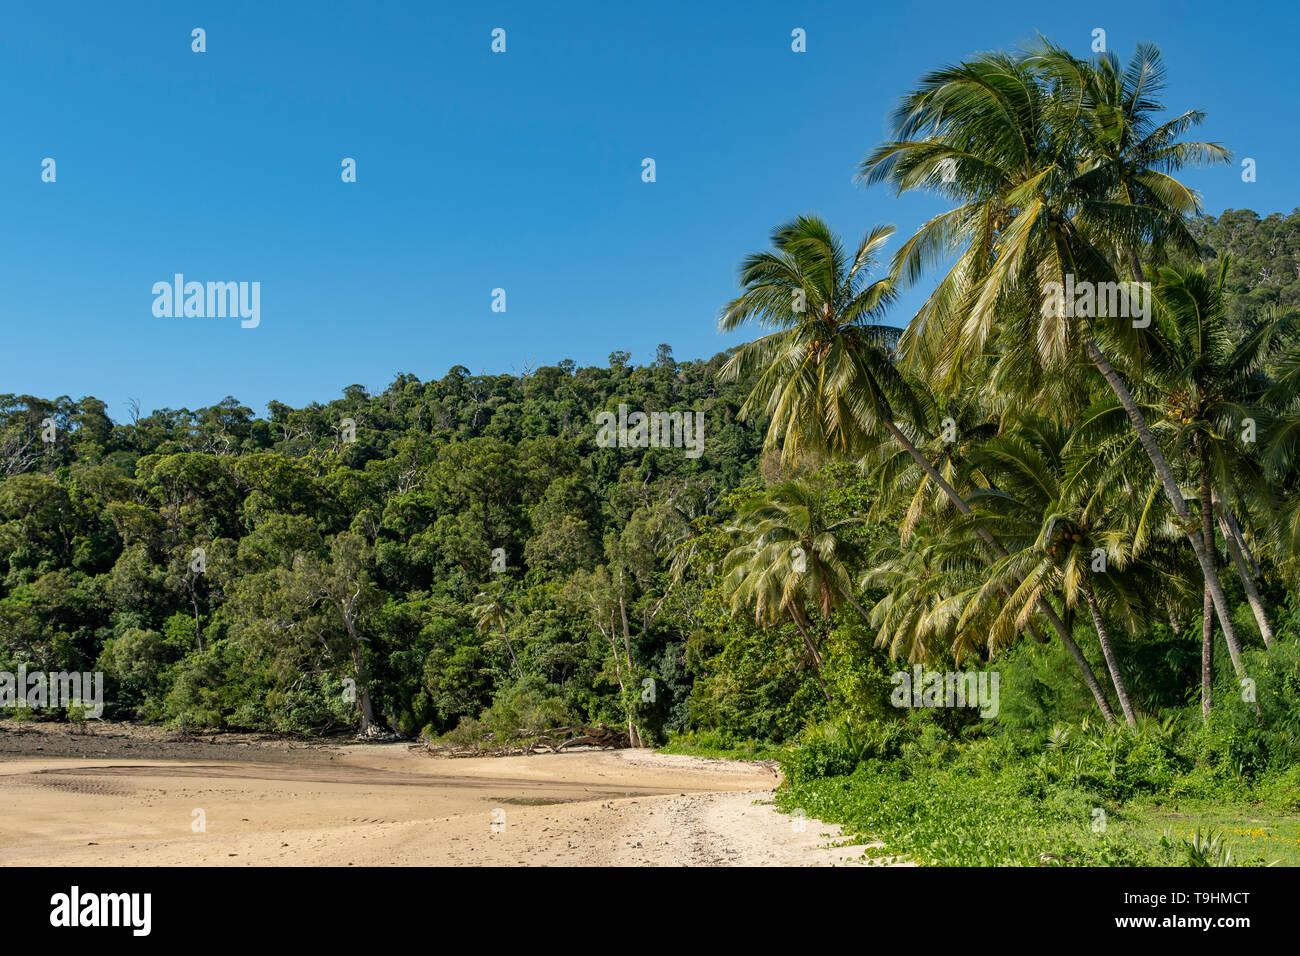 Beach on Dunk Island, Queensland - Stock Image